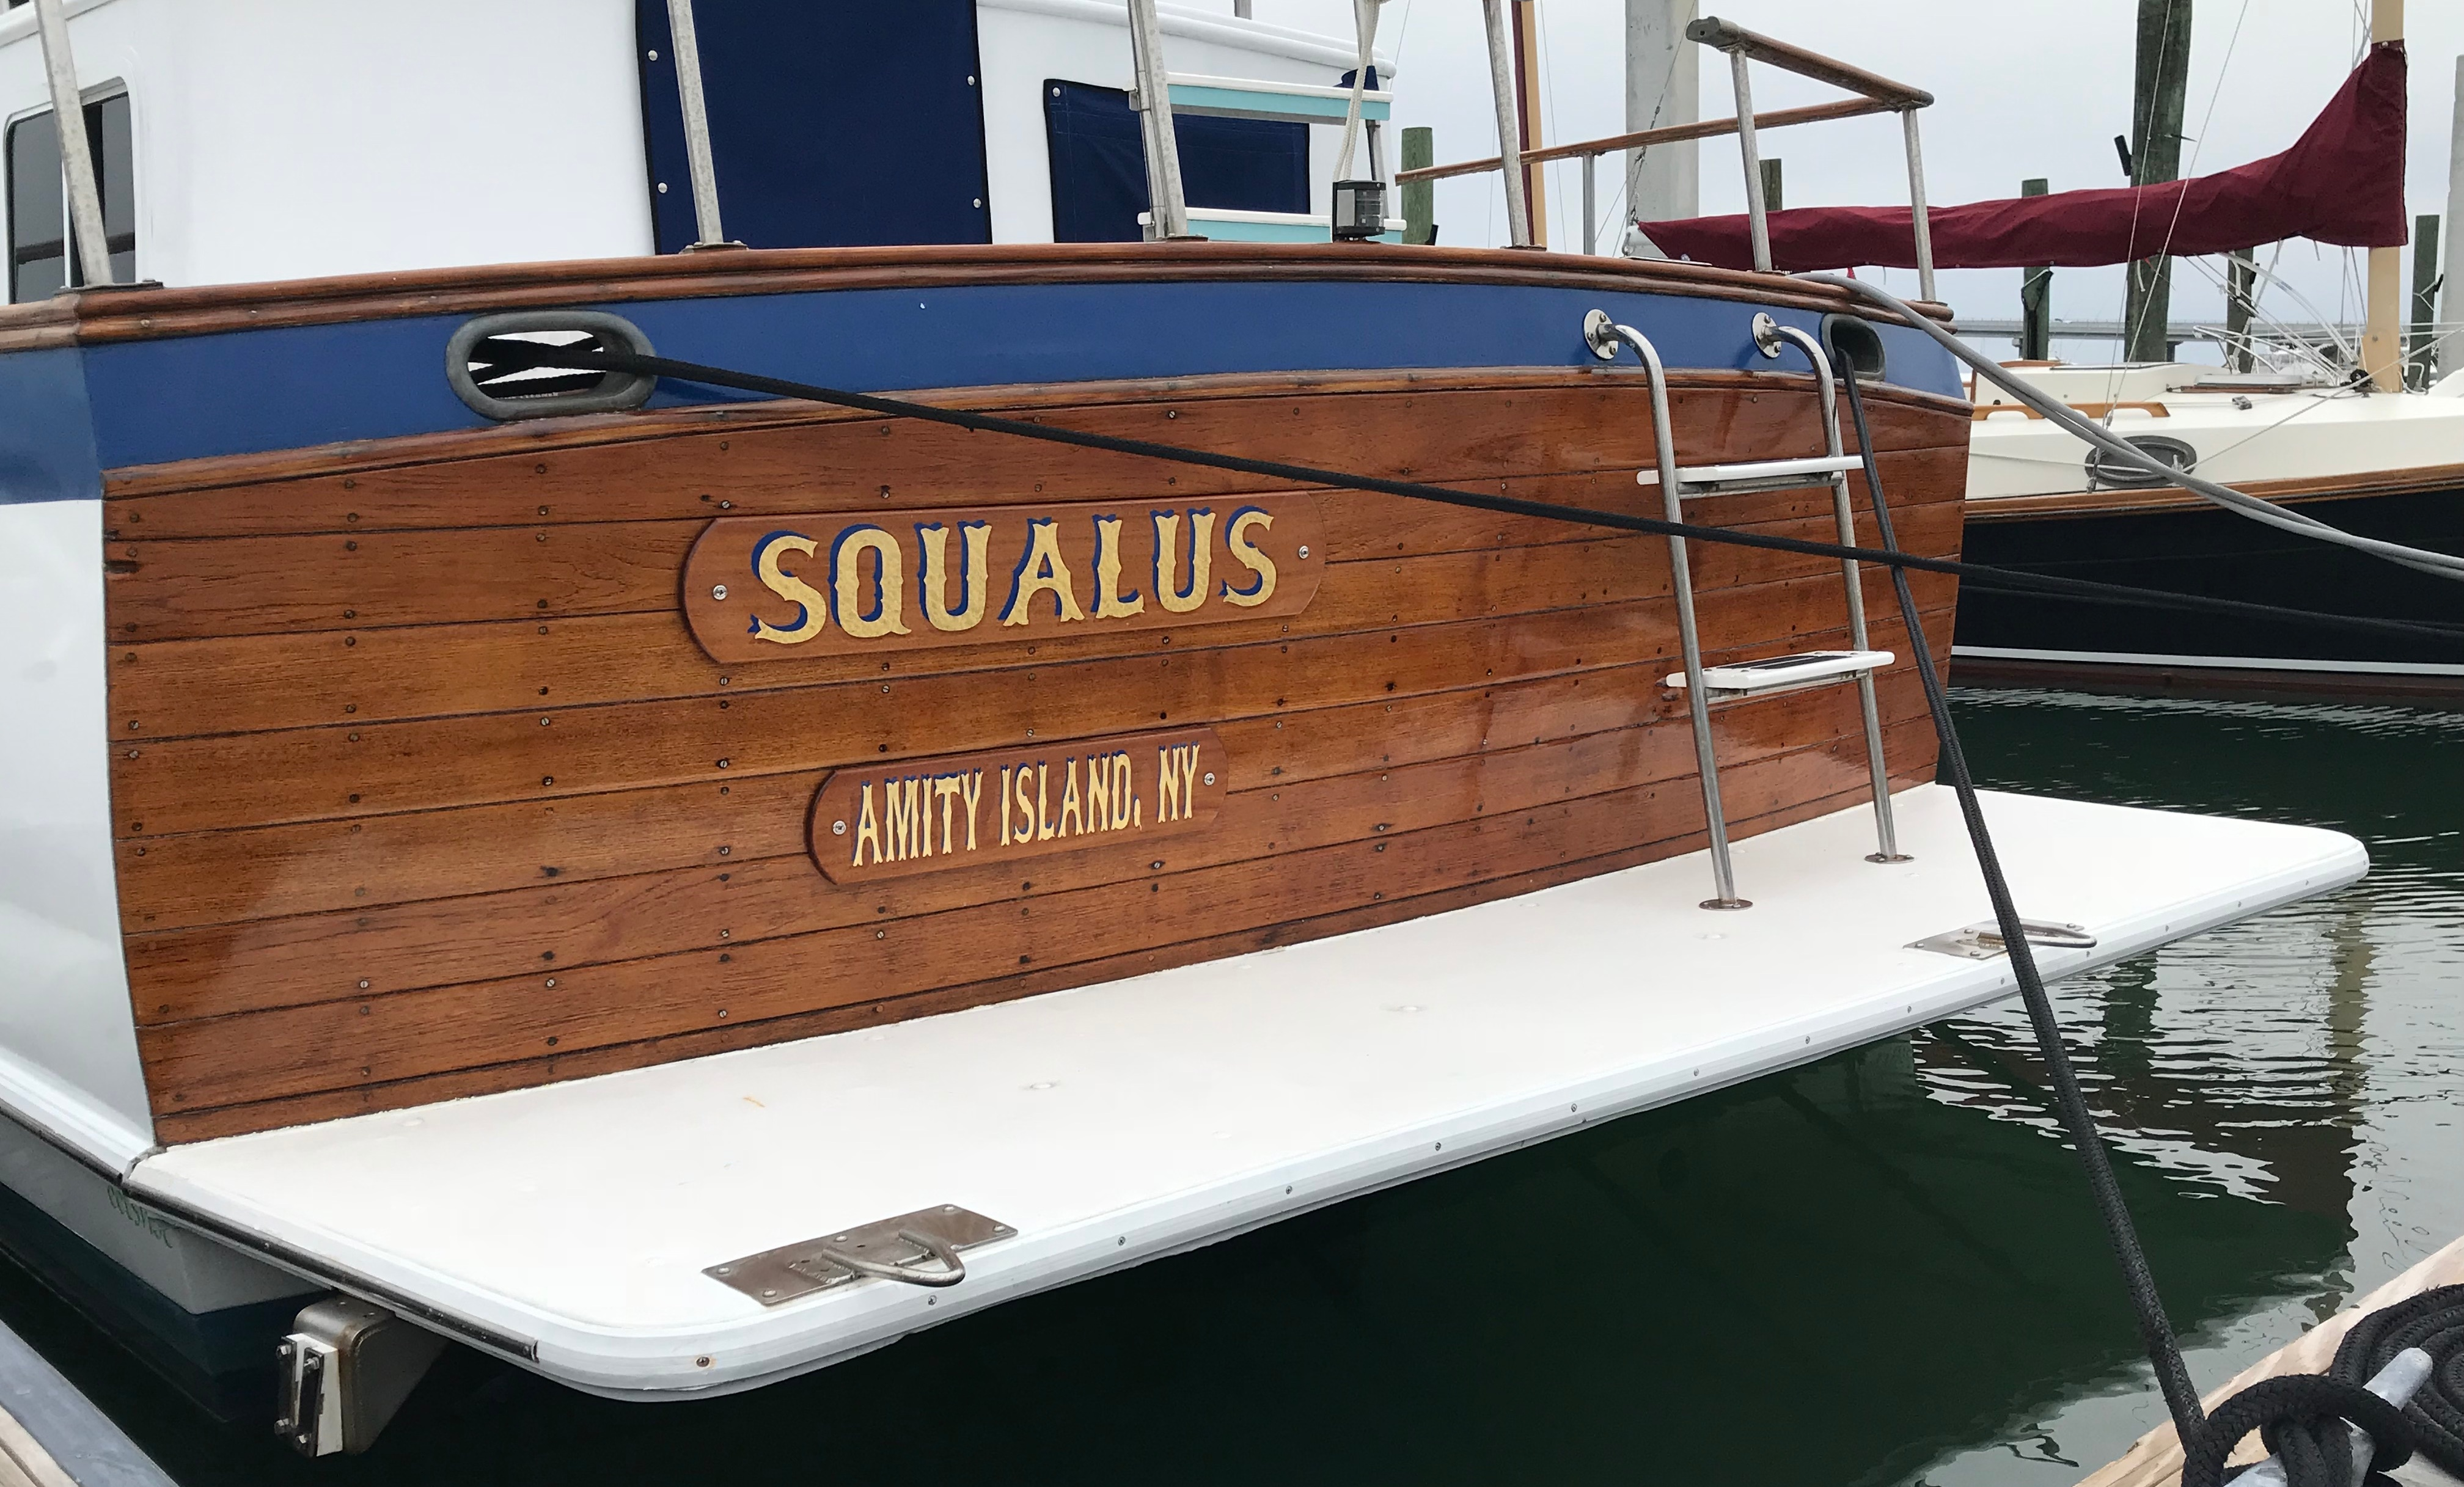 Squalus-1.jpg